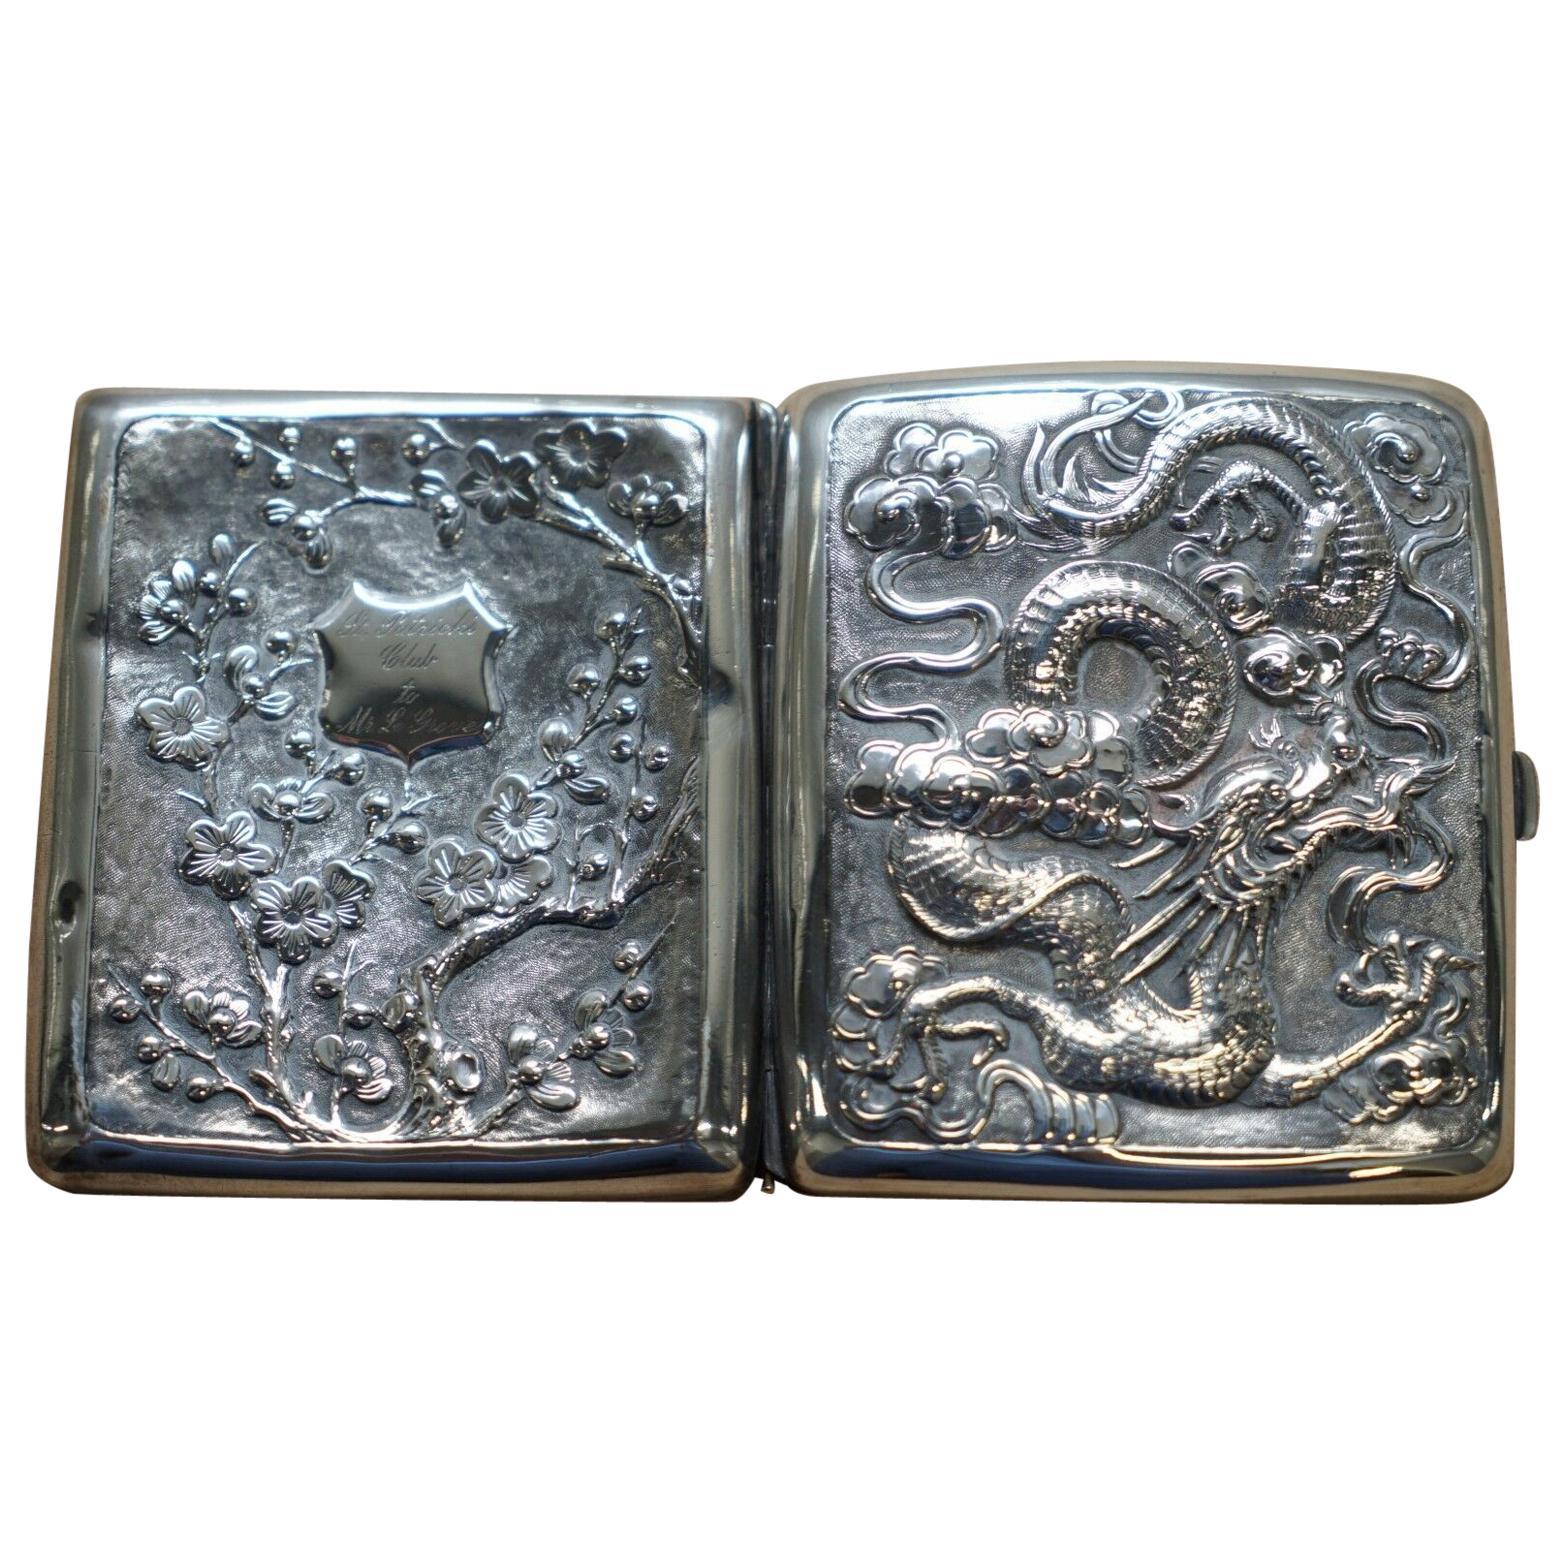 Rare Solid Silver Meiji Period Dragon Embossed Cigarette Case and Gold Gilding